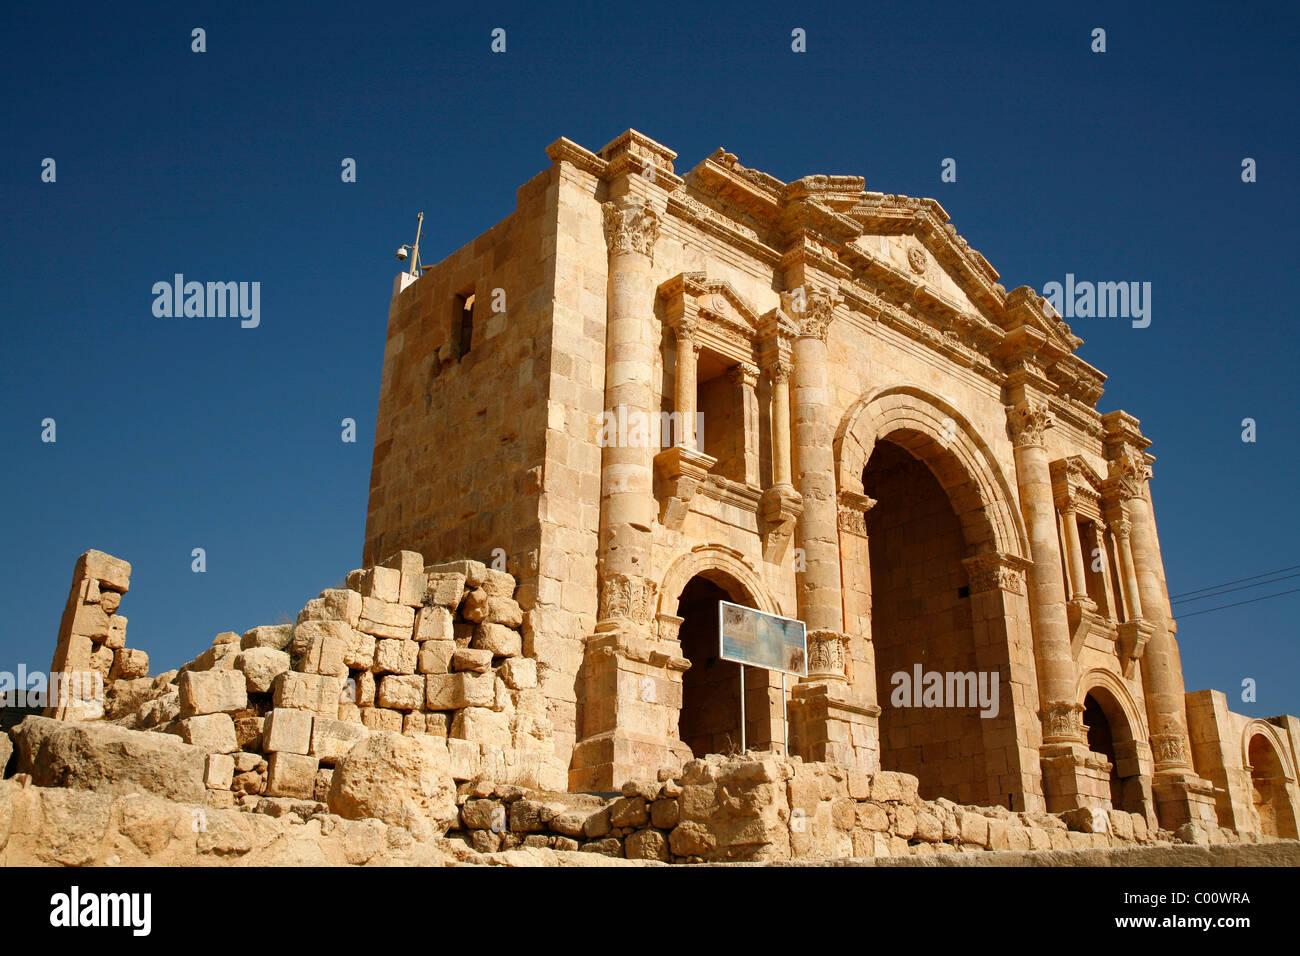 Hadrian's Arch, Jerash, Jordan. - Stock Image